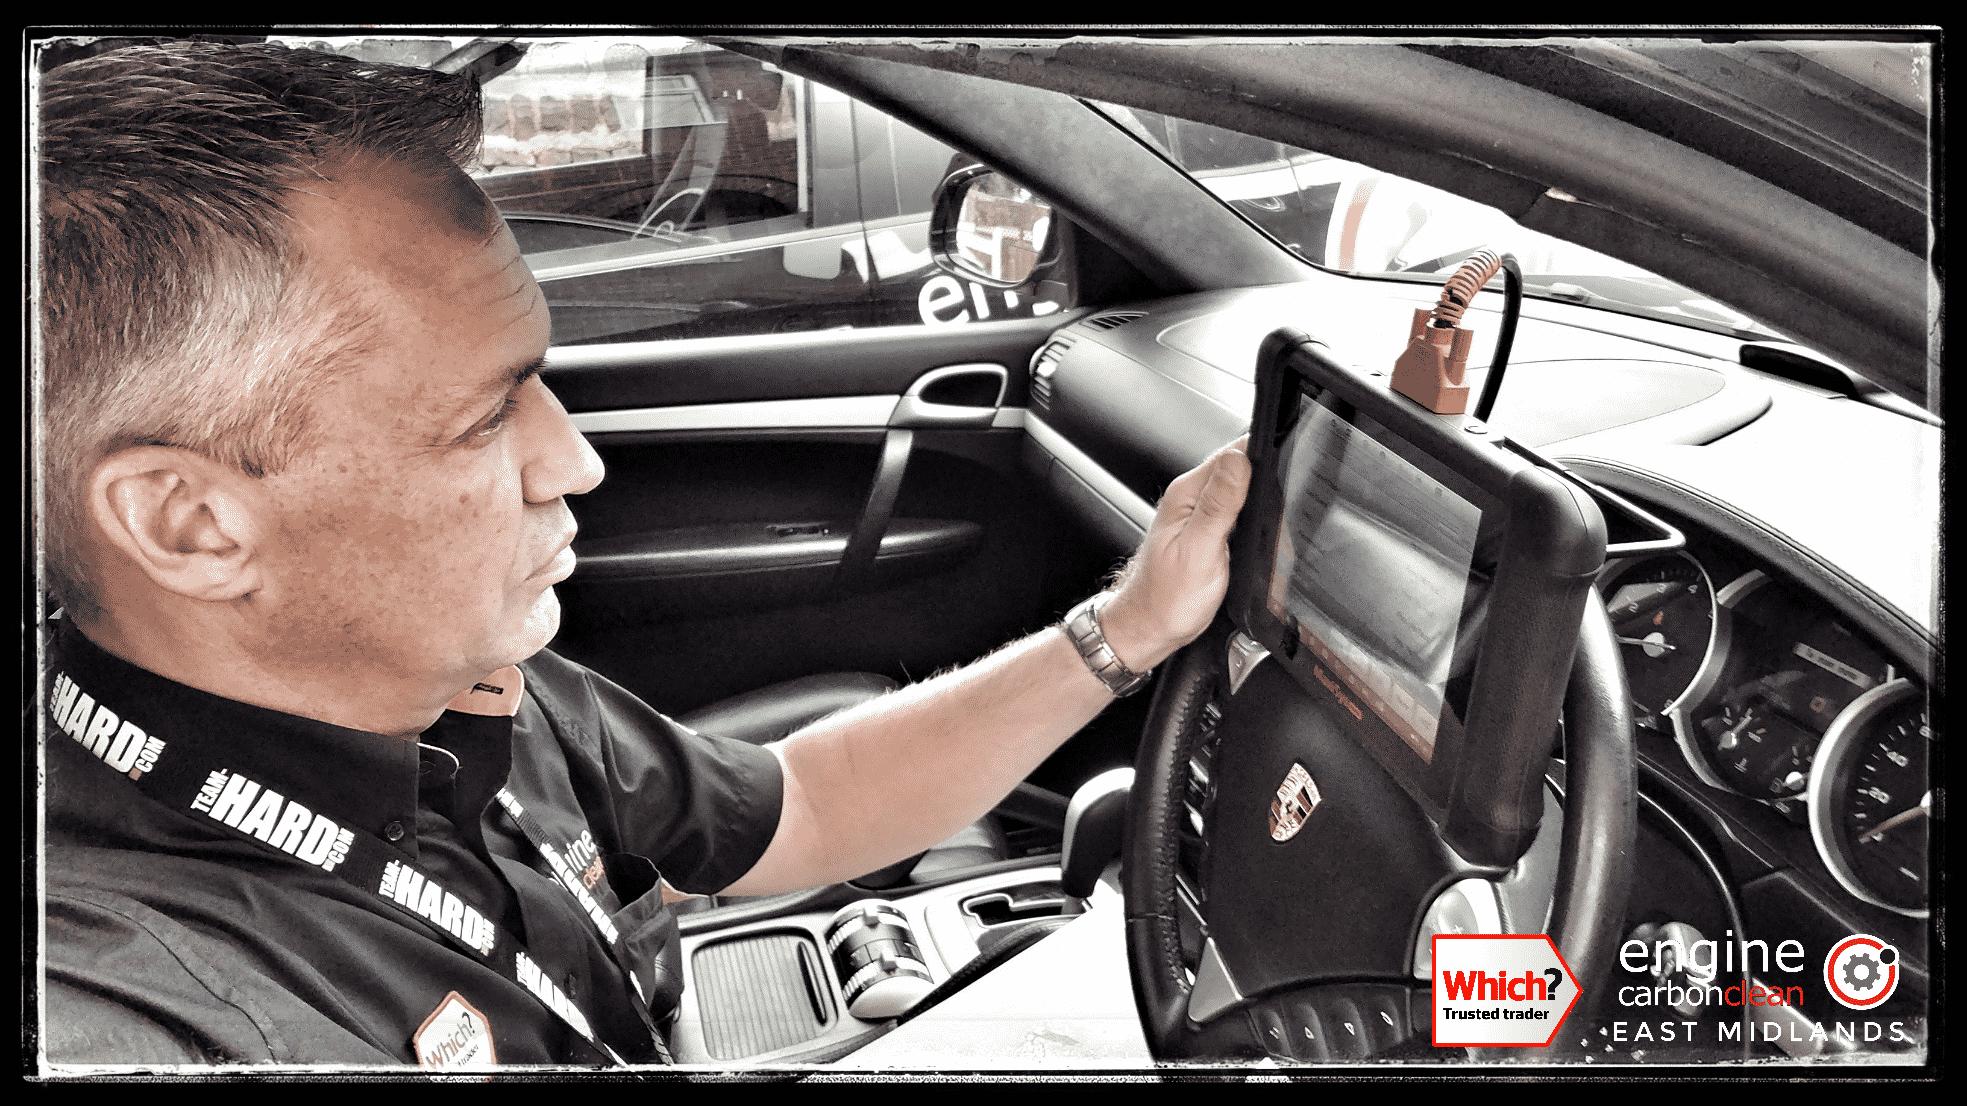 Adrian performing the diagnostics on this Porsche Cayenne Turbo (2006) - 132,381 miles